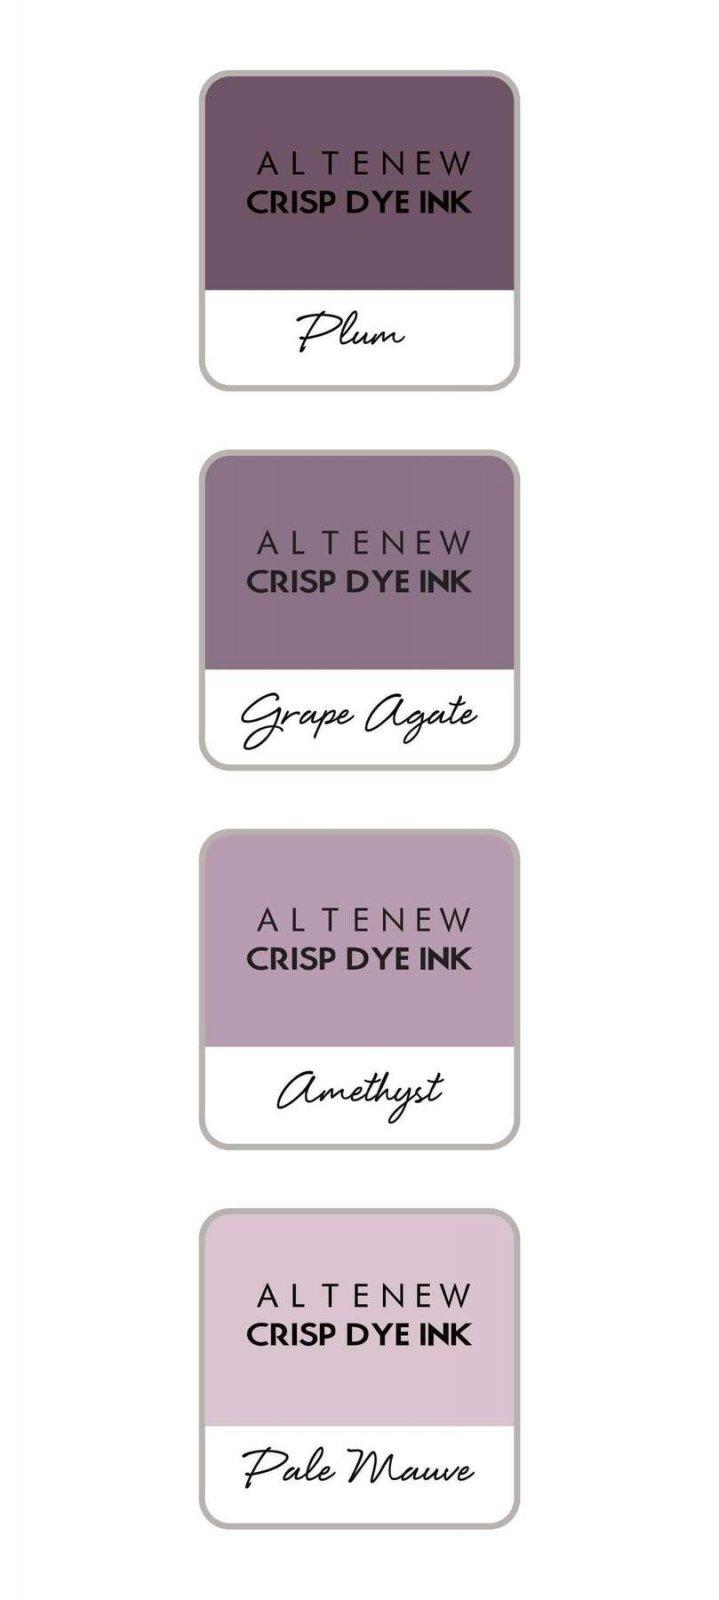 Altenew - Sugarplums Crisp Dye Ink Mini Cube Set